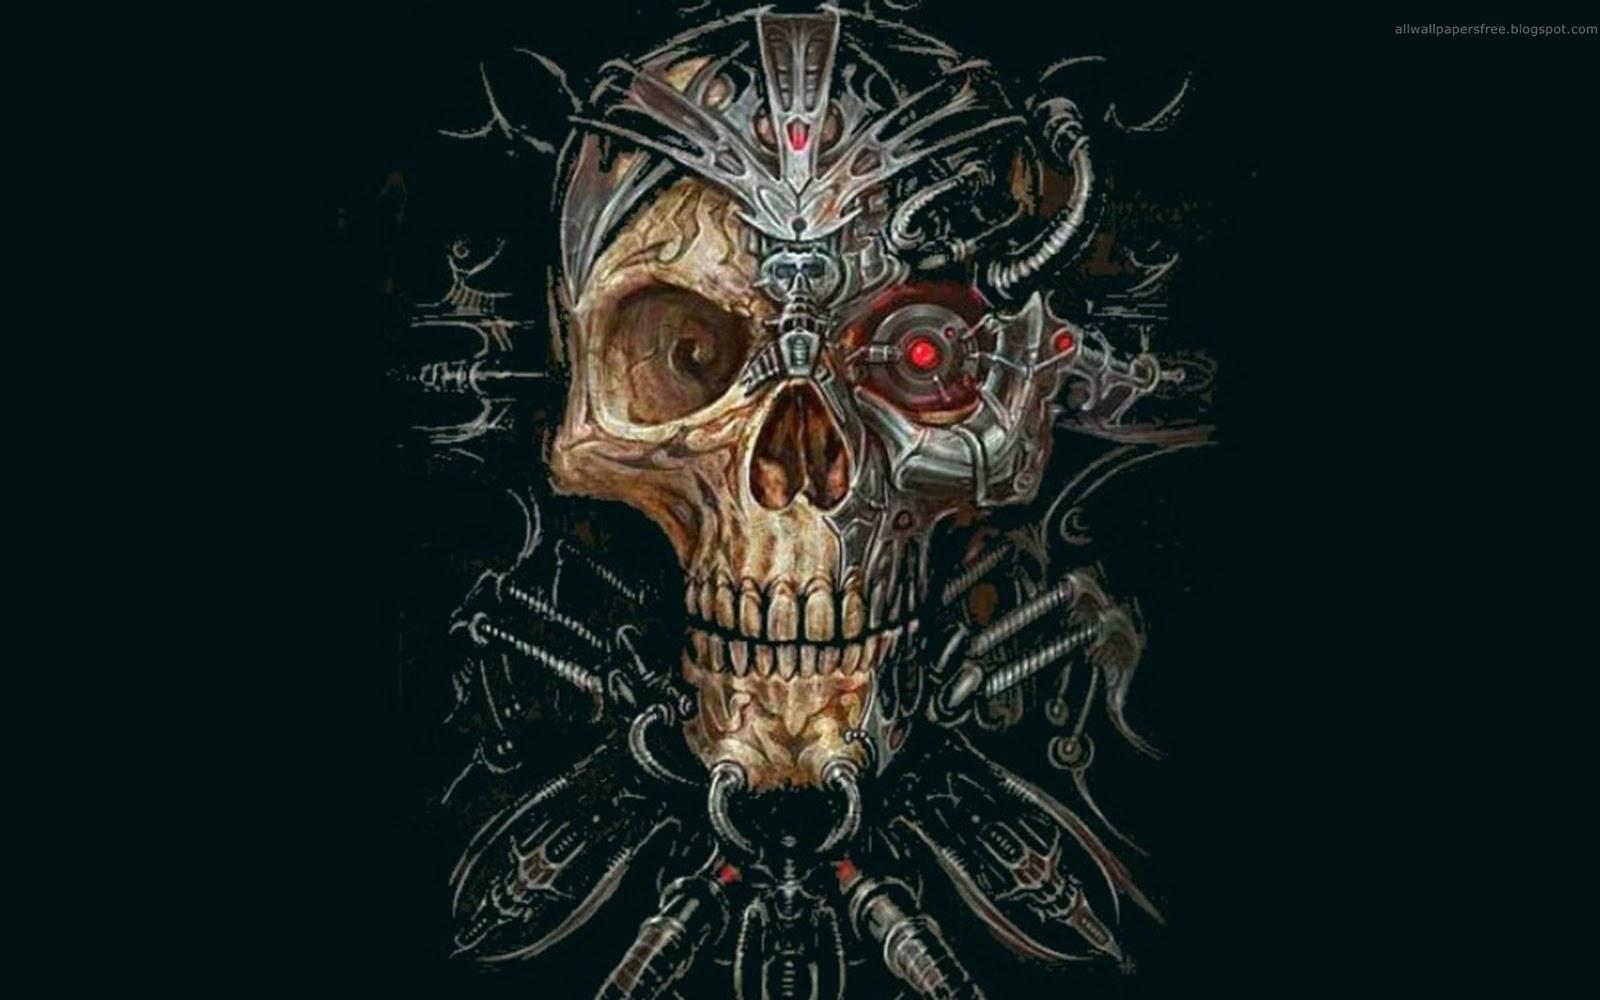 zombie skull wallpapers for desktop - photo #28